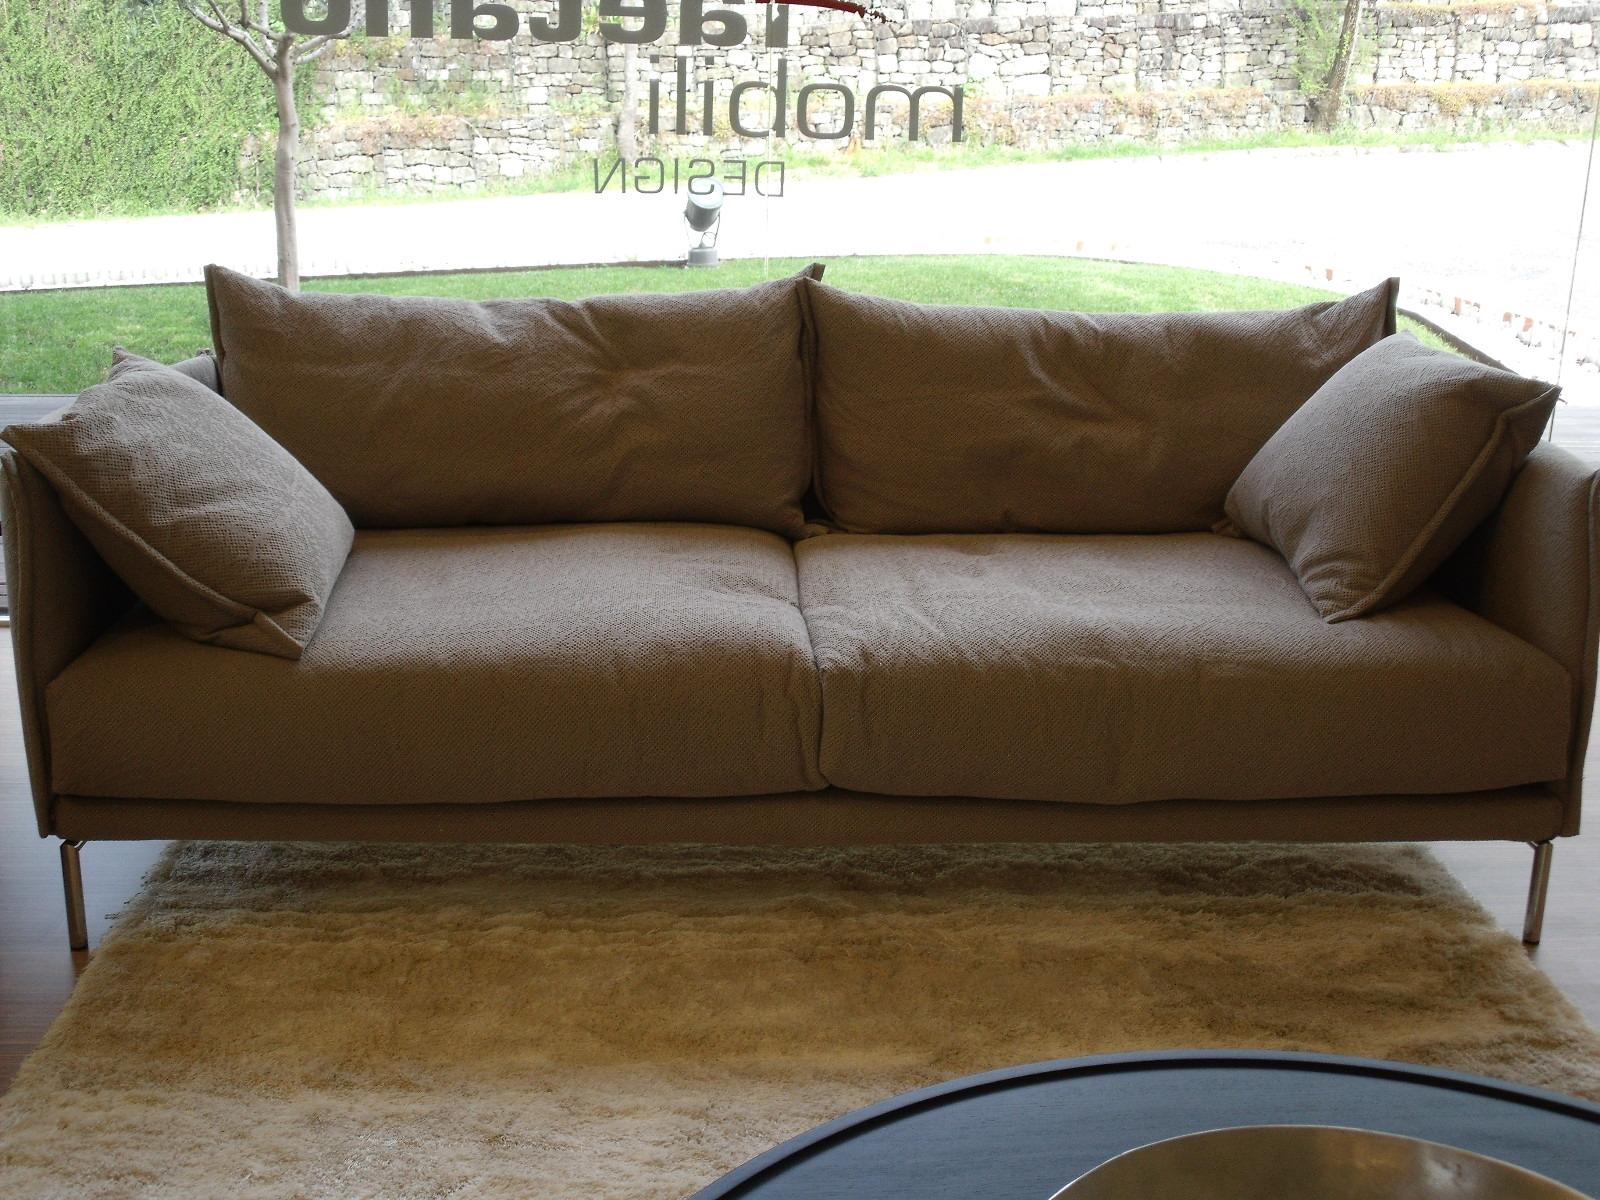 Divano moroso gentry divano tessuto divani a prezzi scontati for Divano tessuto